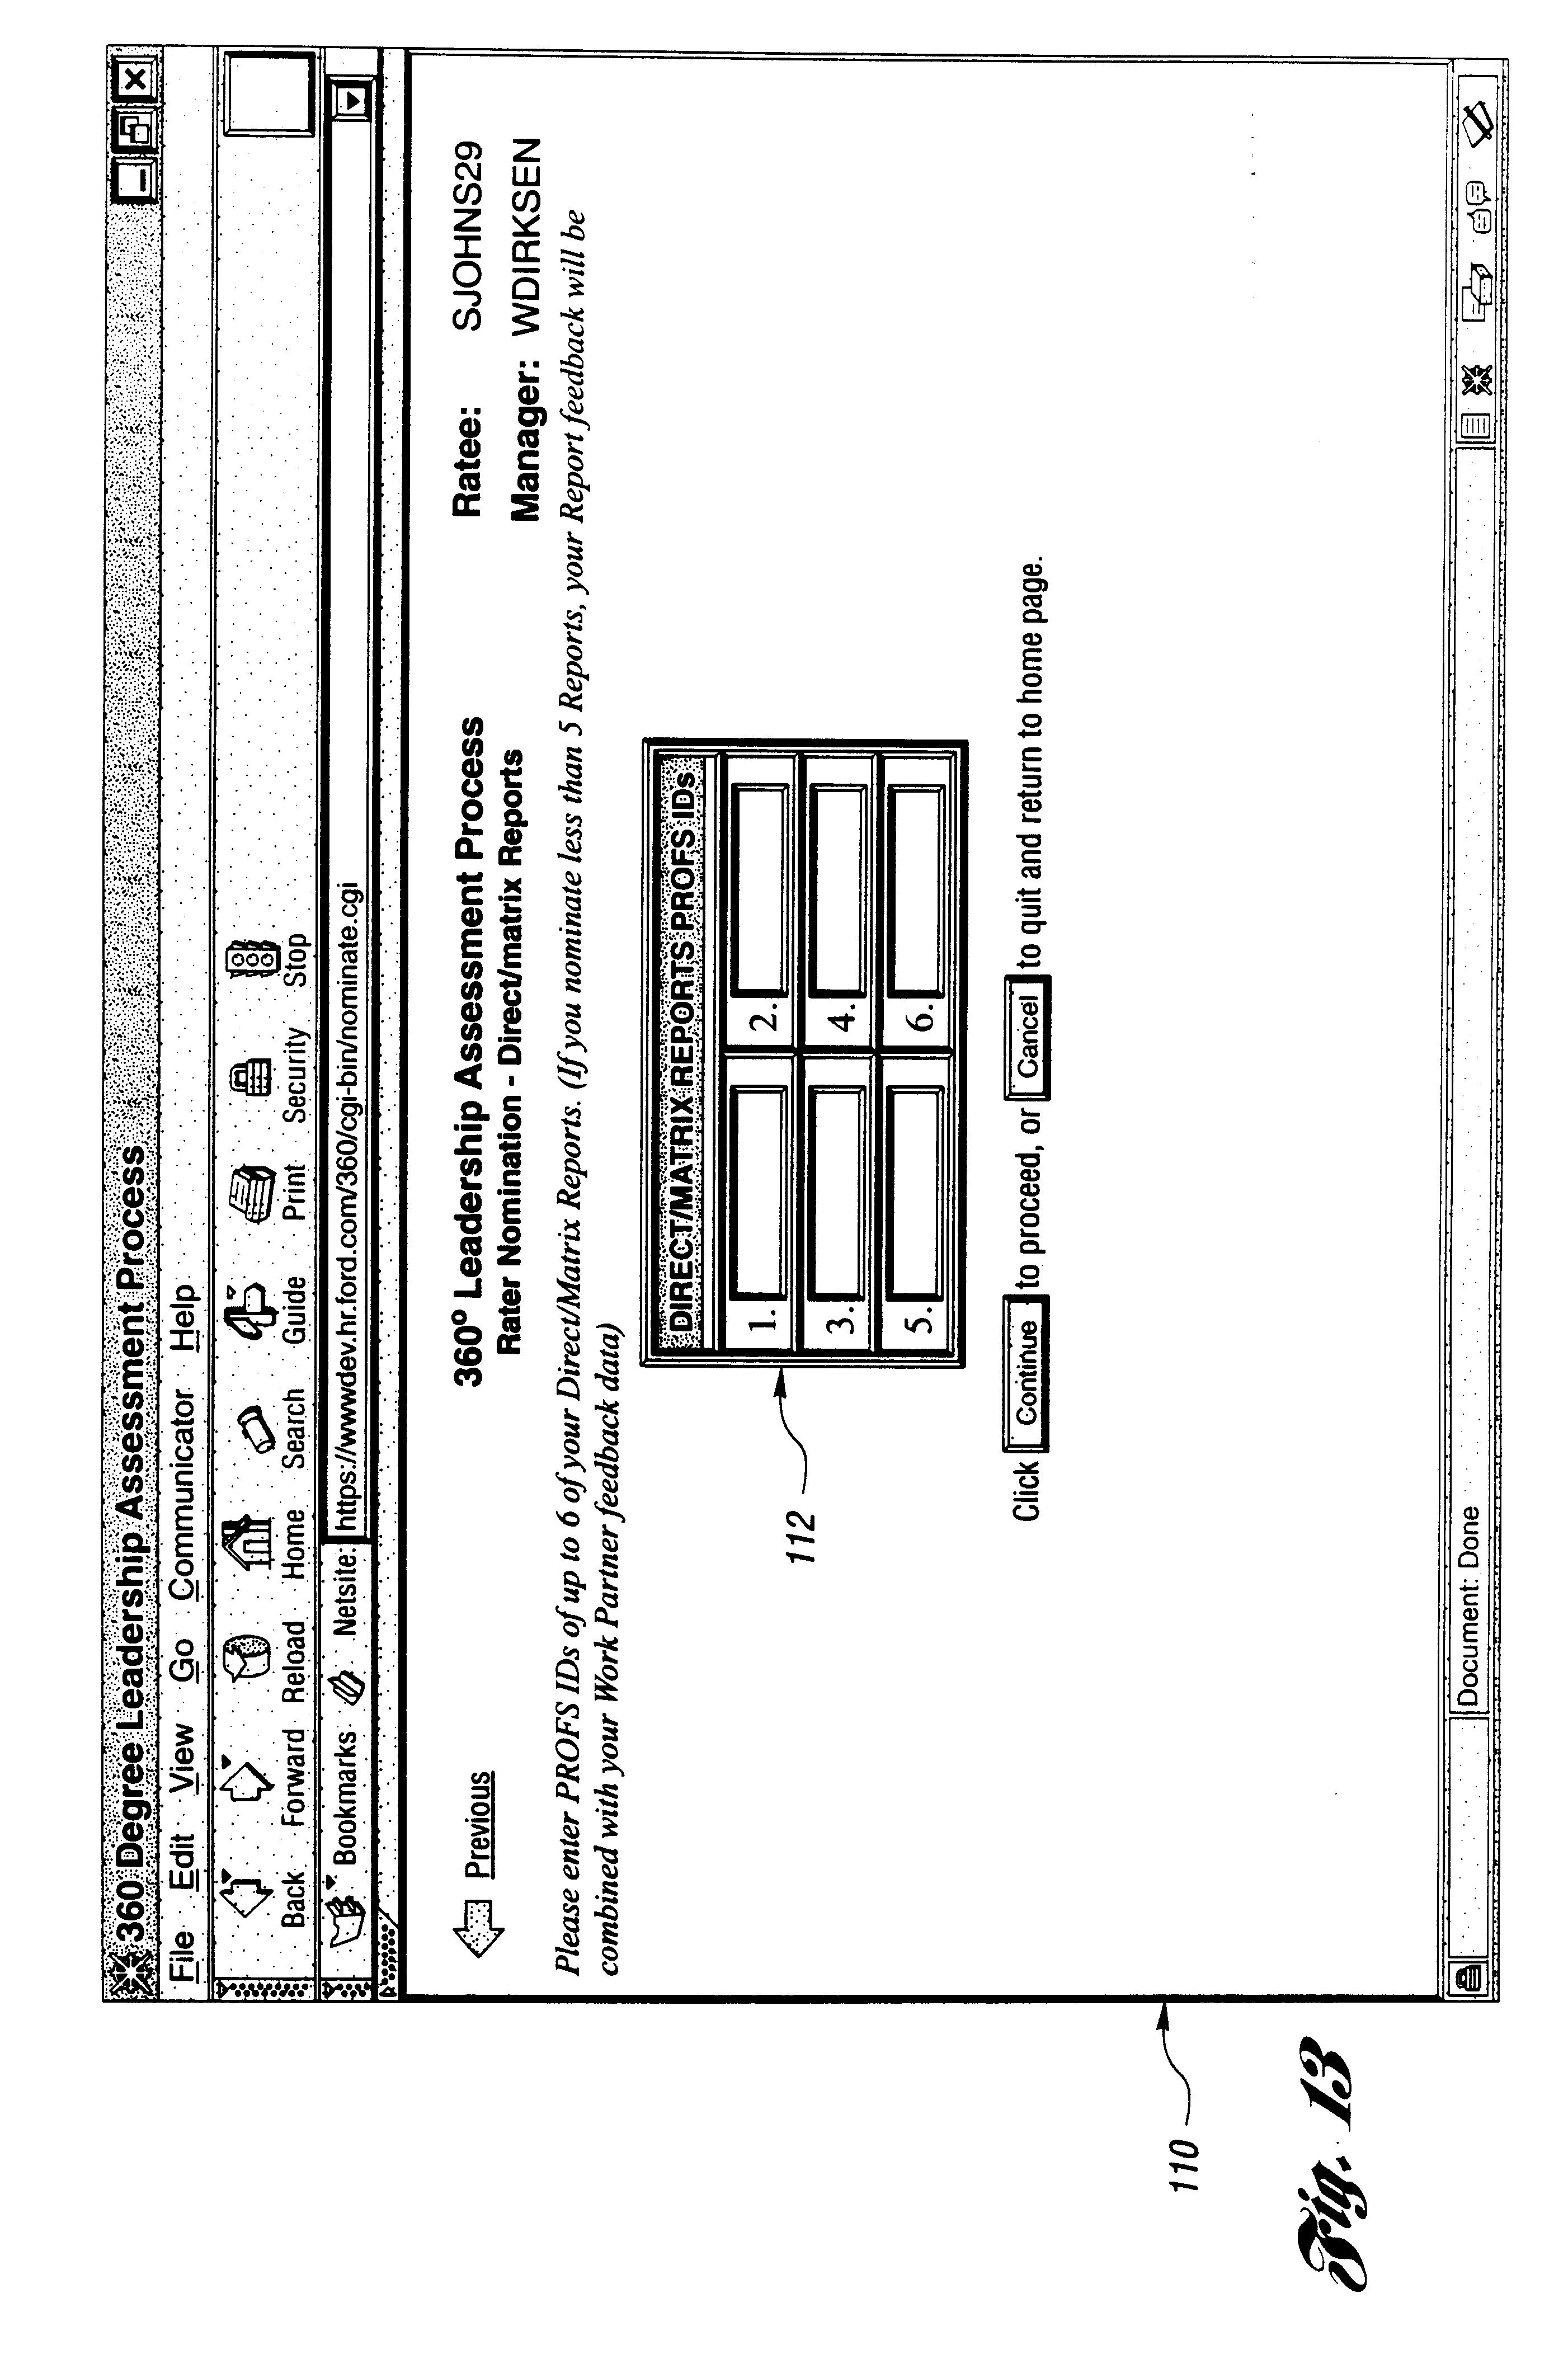 kenwood kdc mp142 wiring diagram kenwood harness diagram